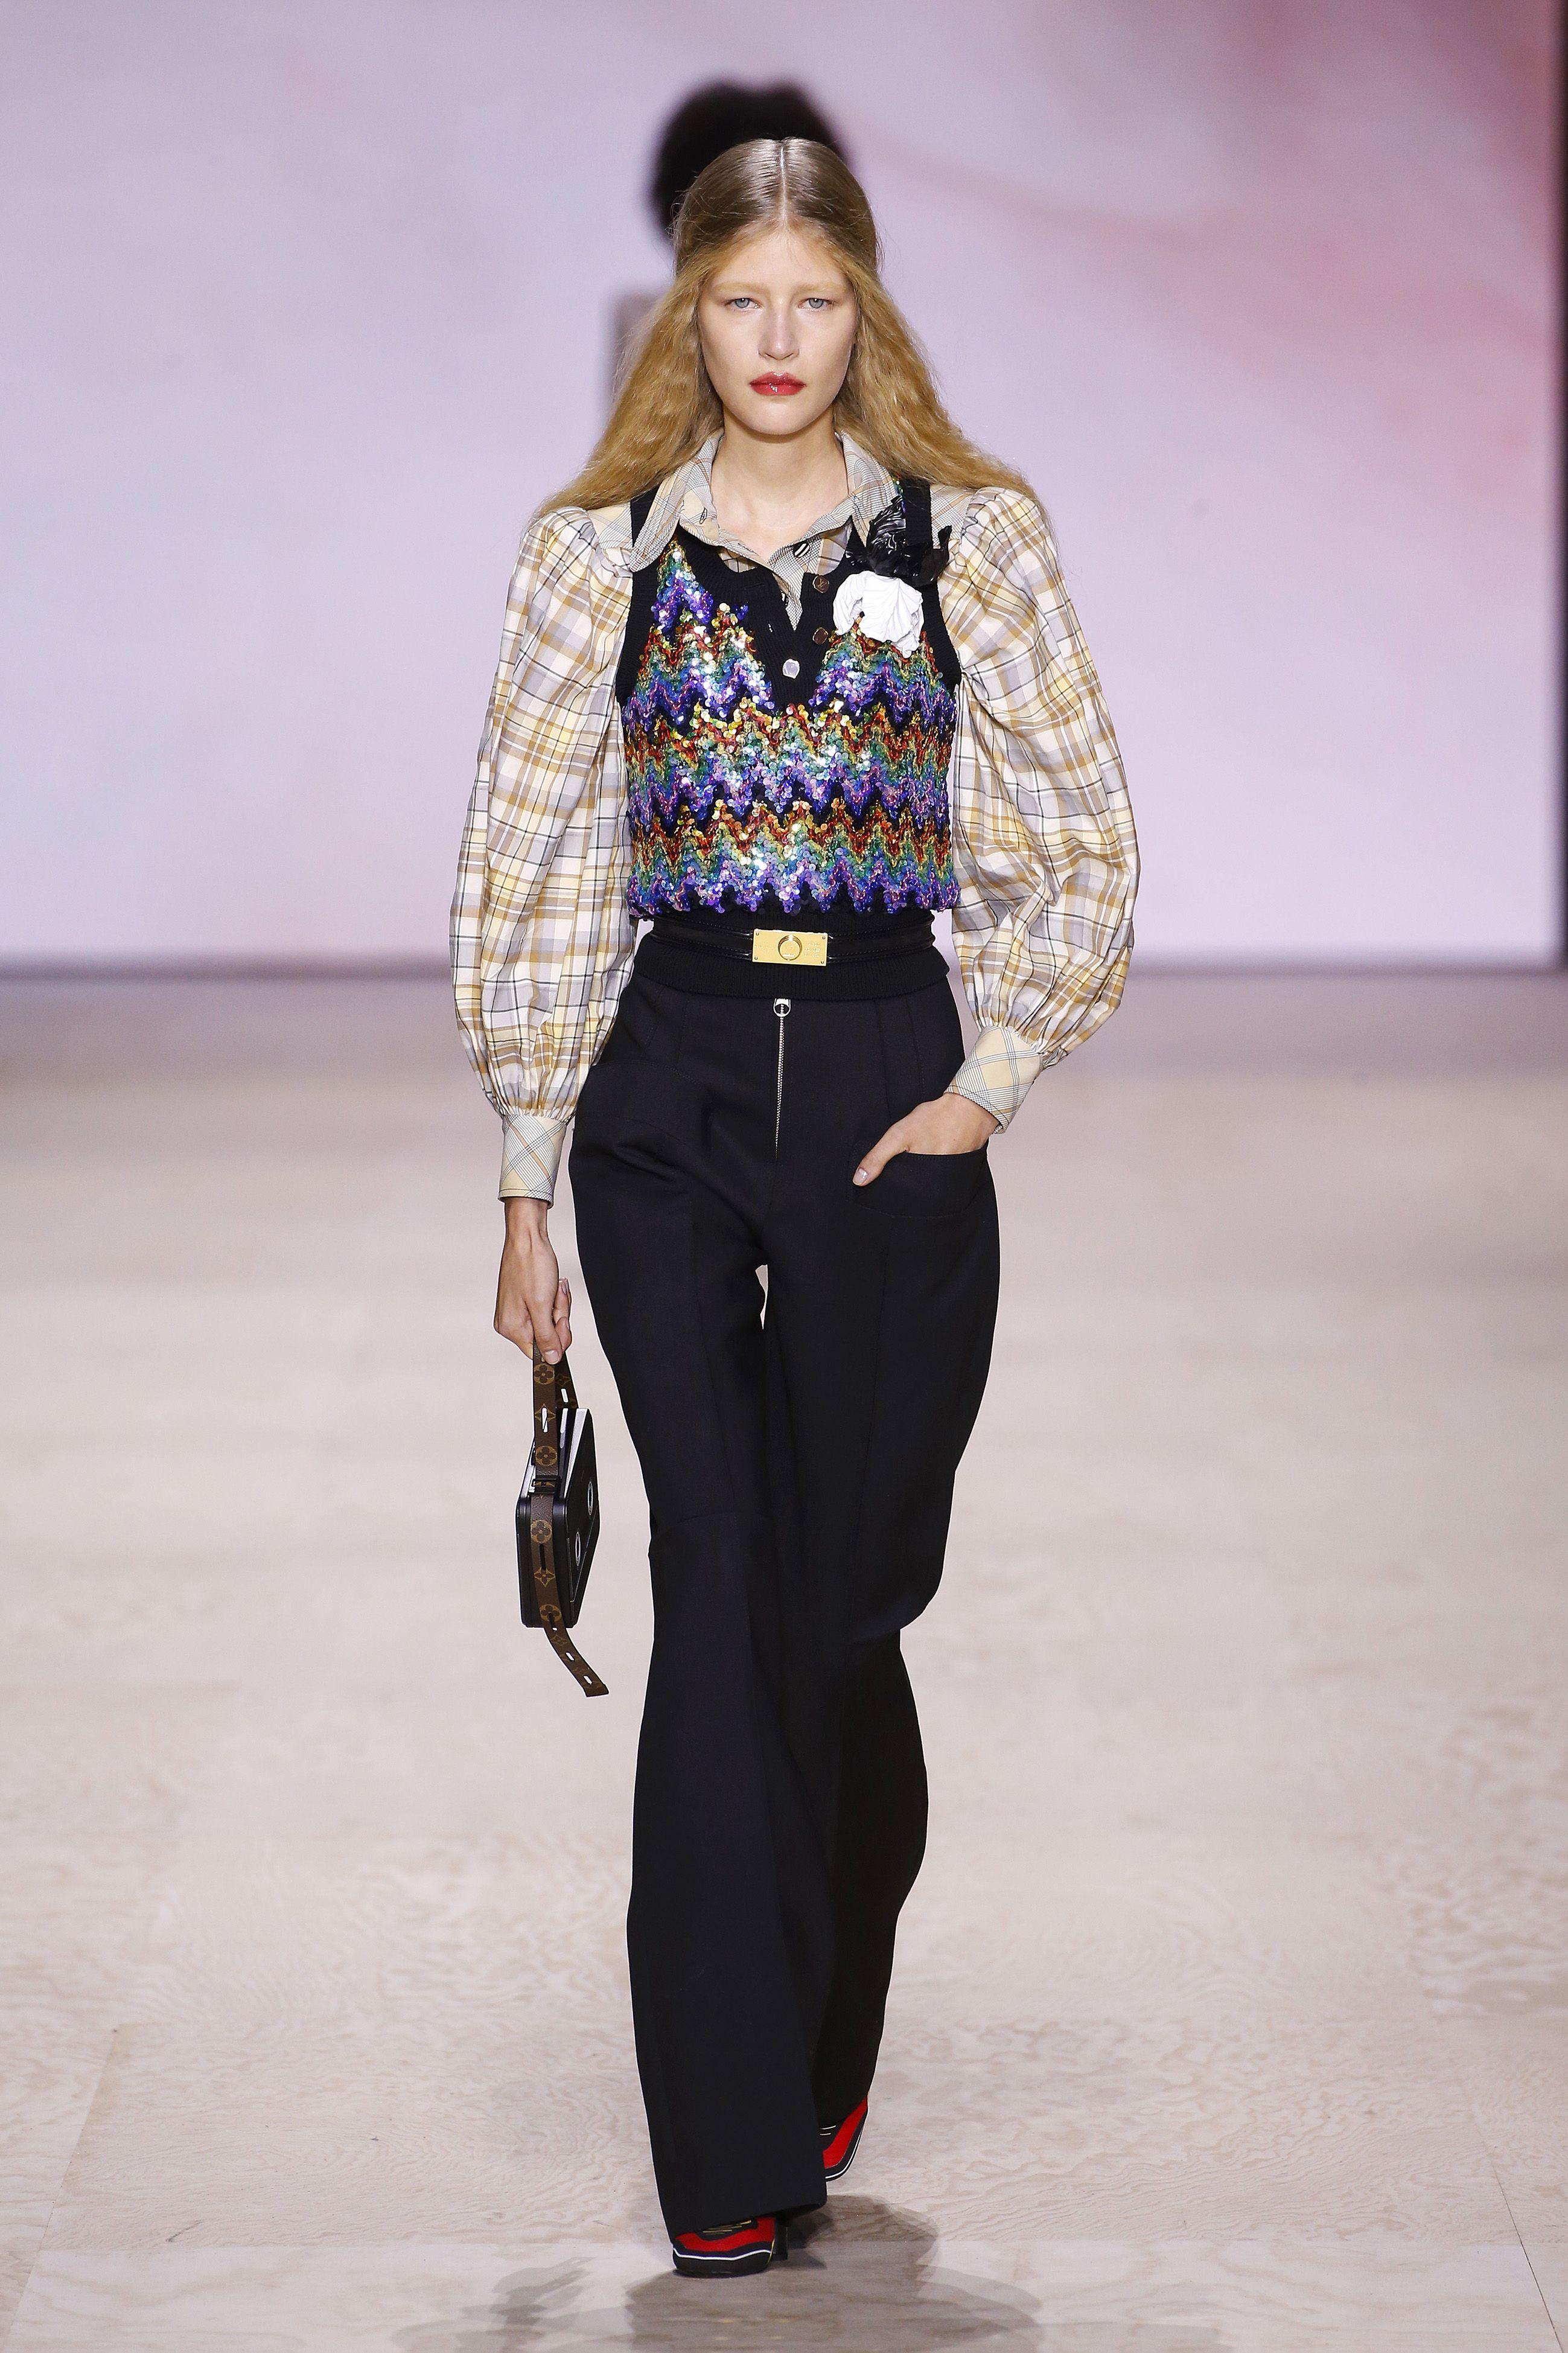 Louis Vuitton Closed Out Fashion Month With a Colorful Ode to Belle Époque Paris